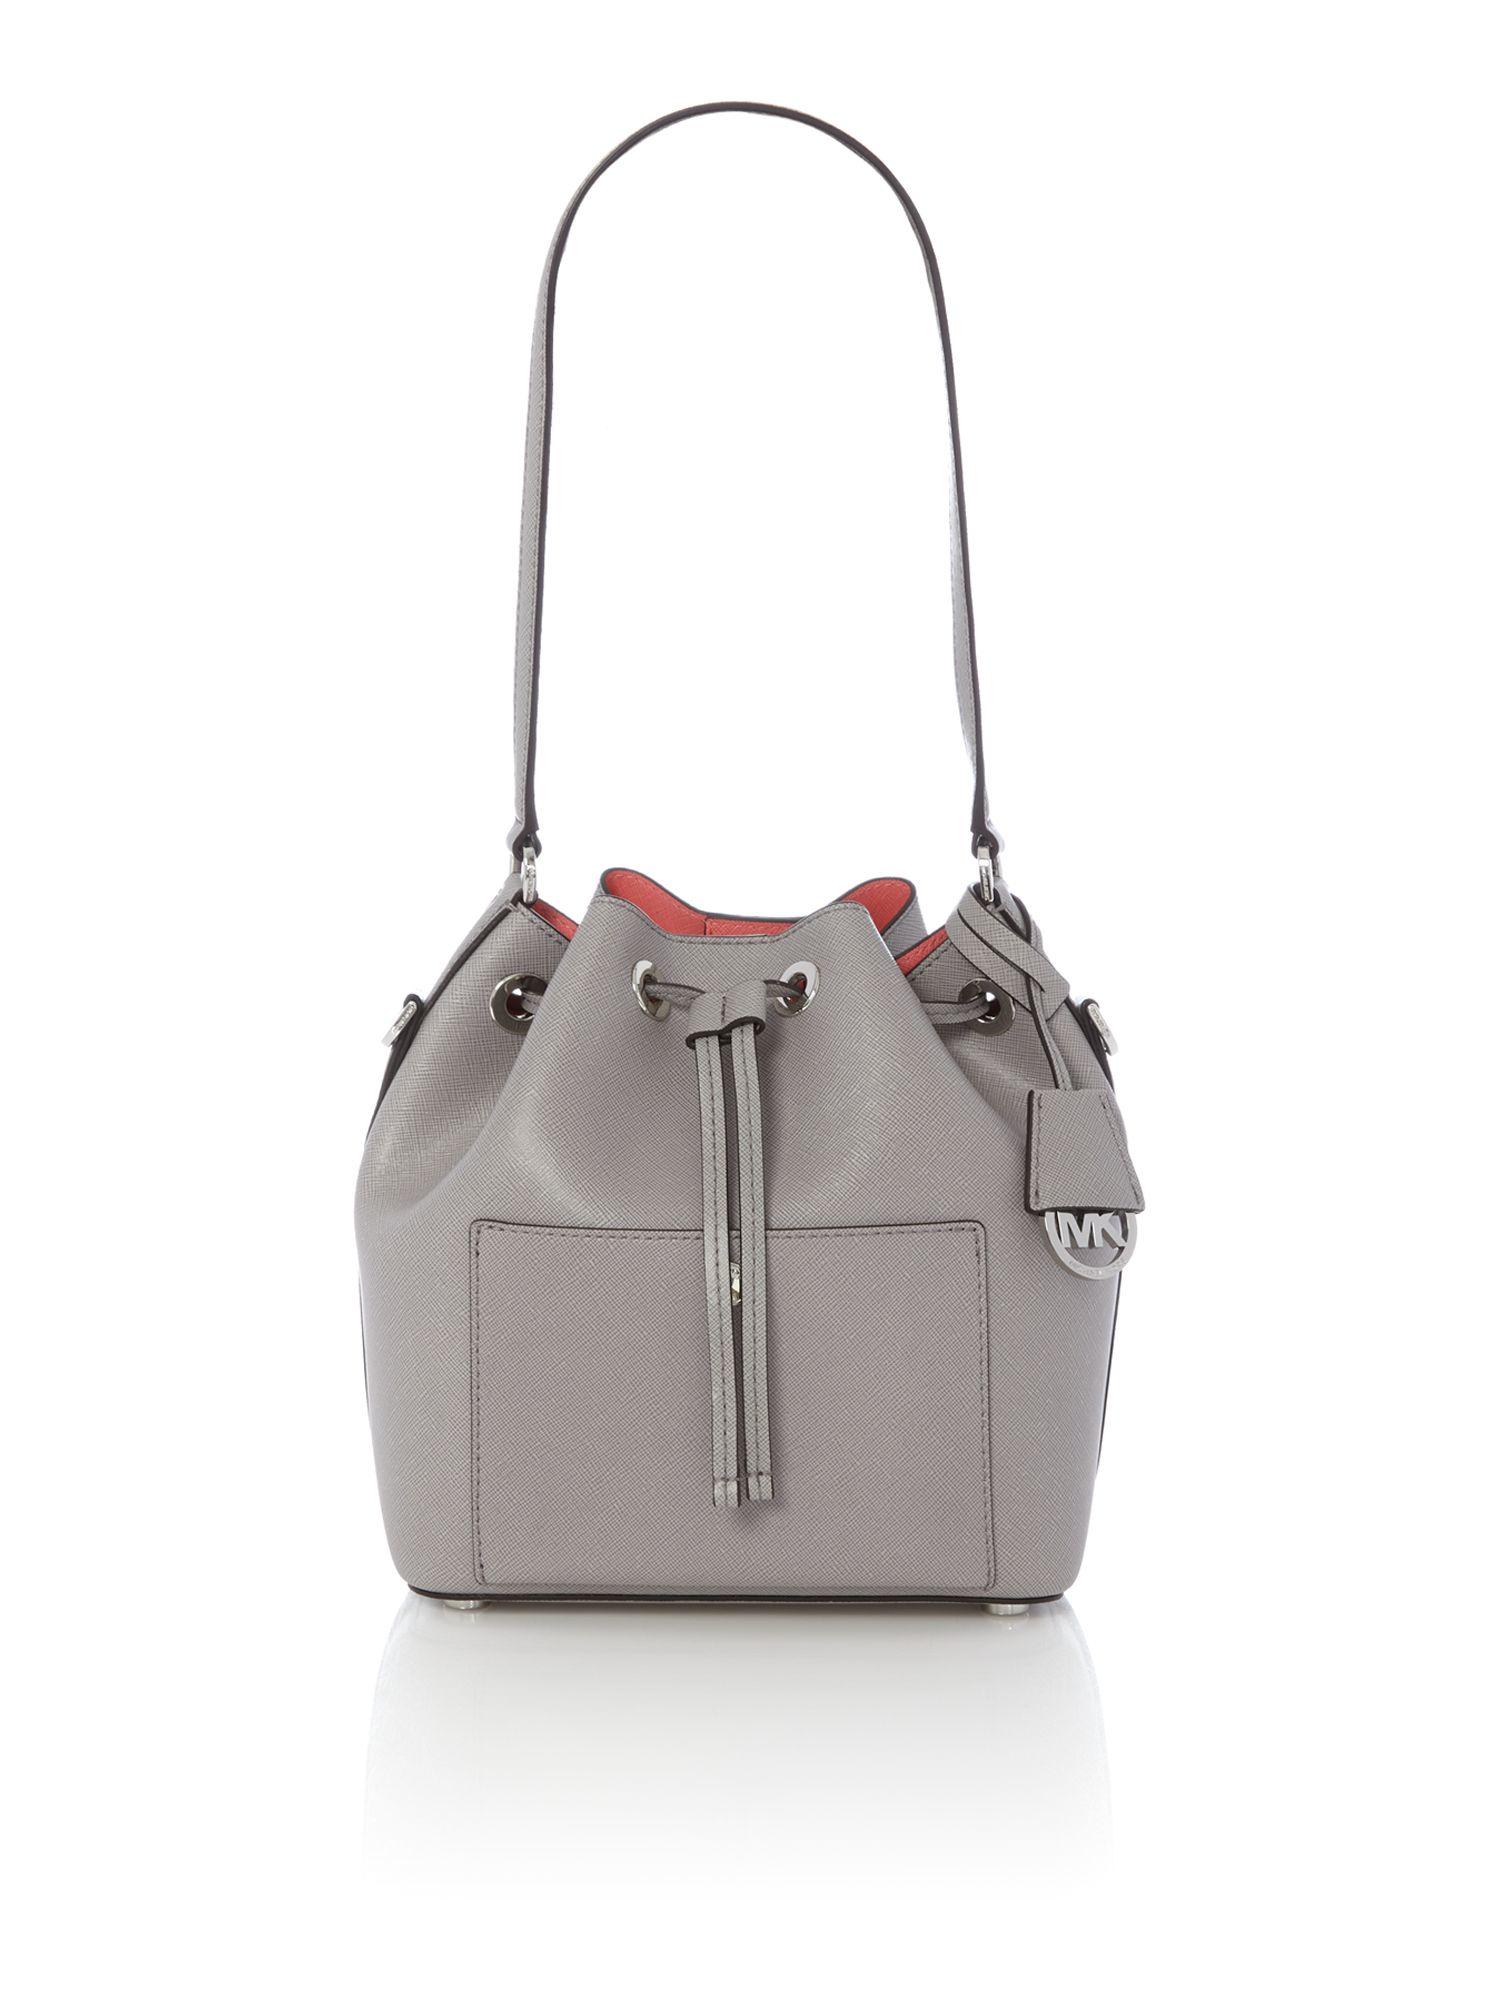 Michael Kors Bag Grey